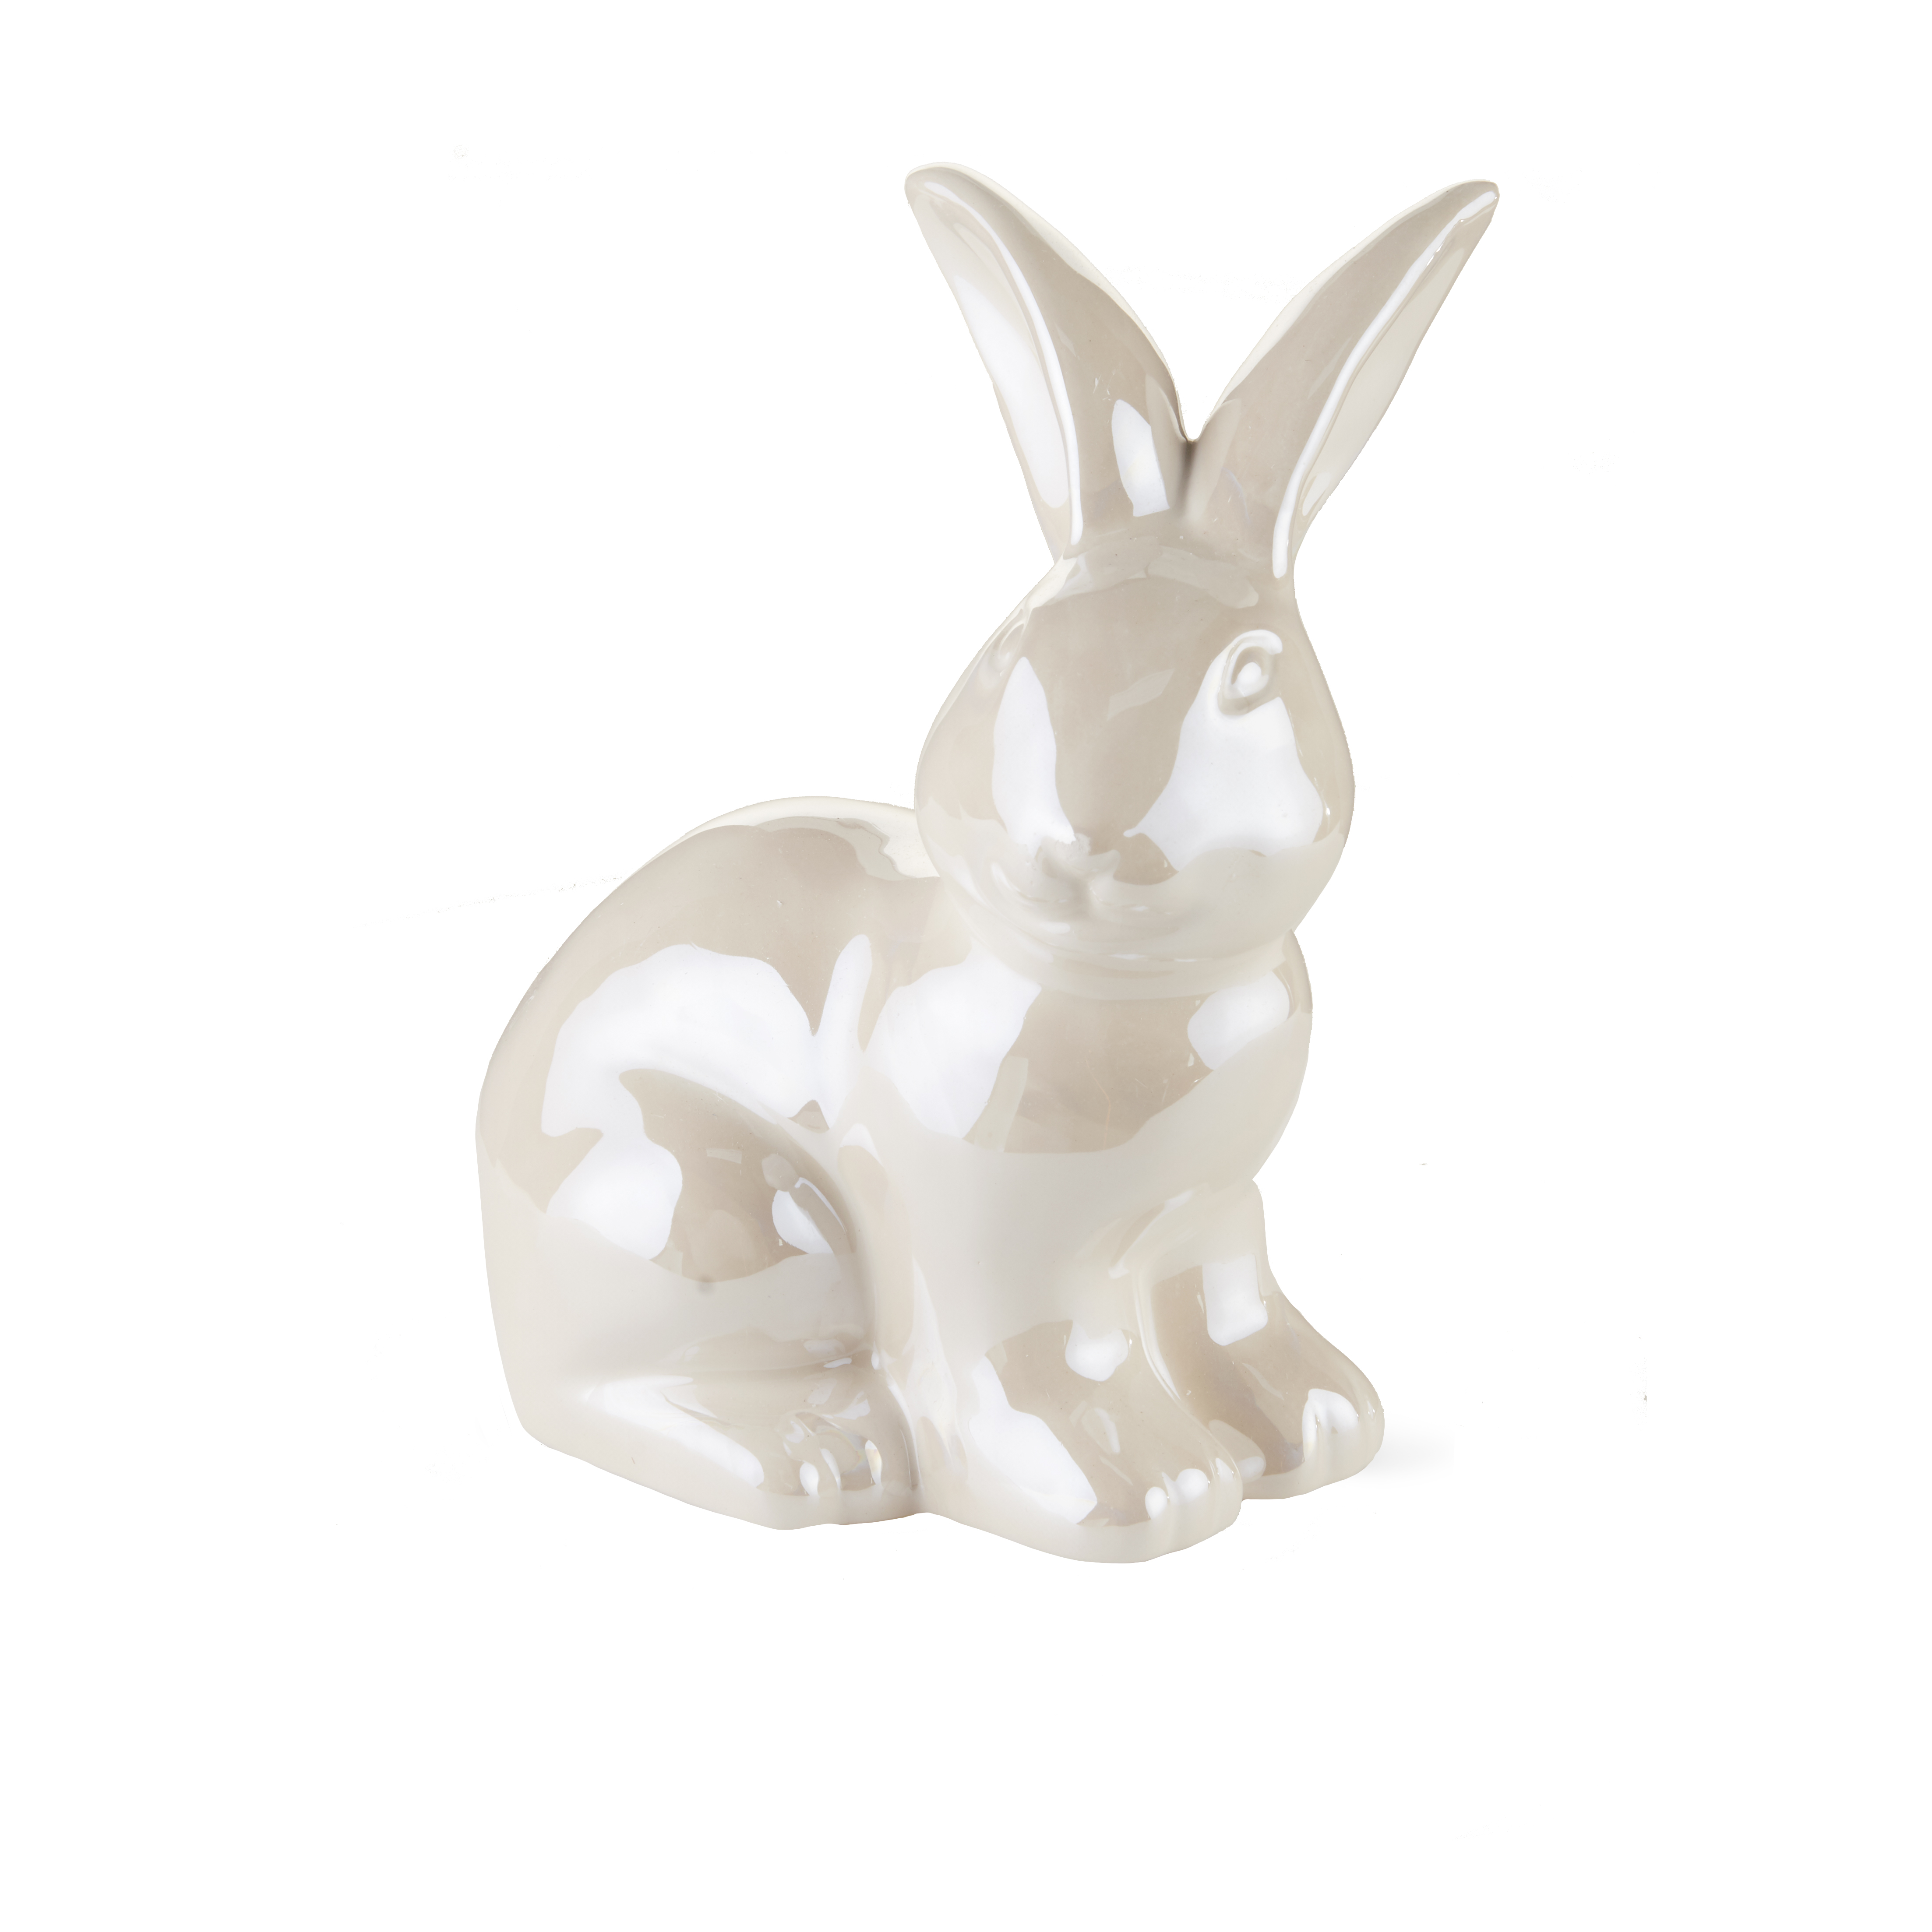 Way To Celebrate Easter Ceramic Bunny Decor, Sitting